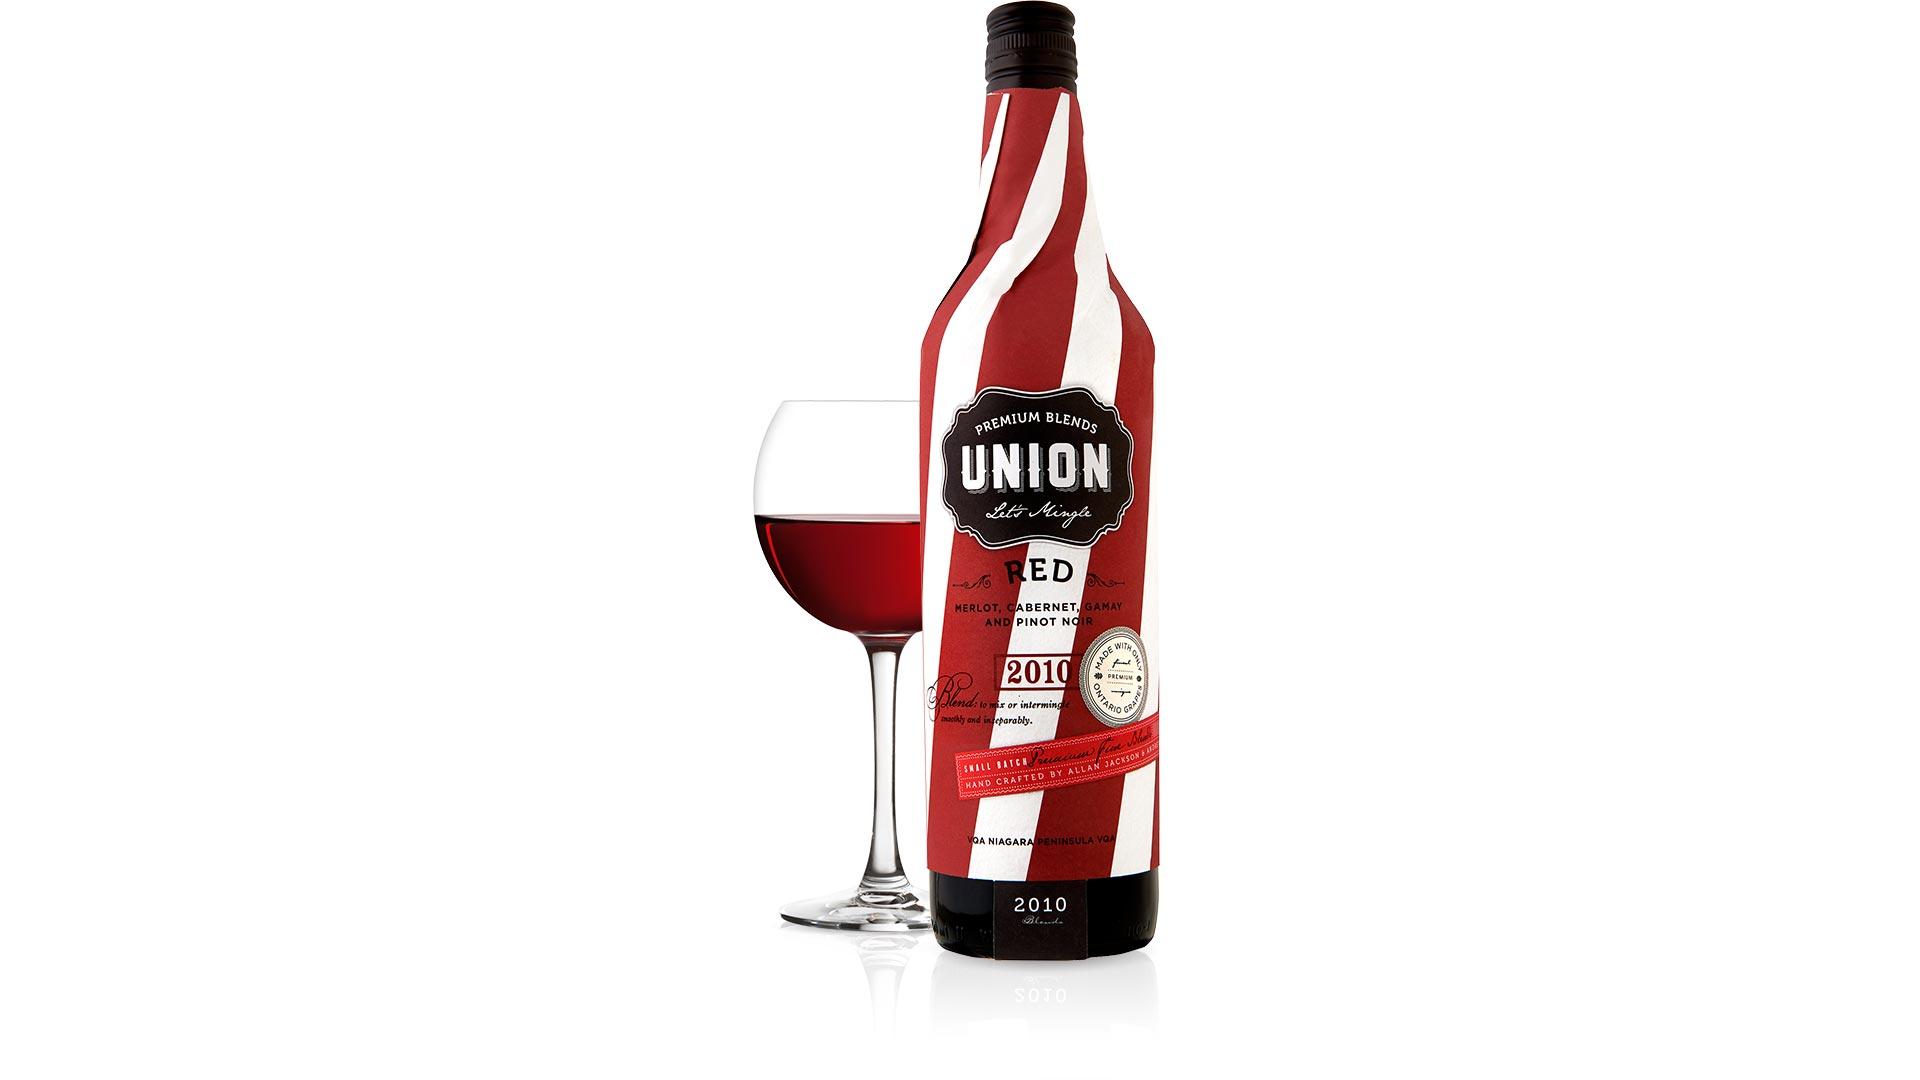 union-red.jpg